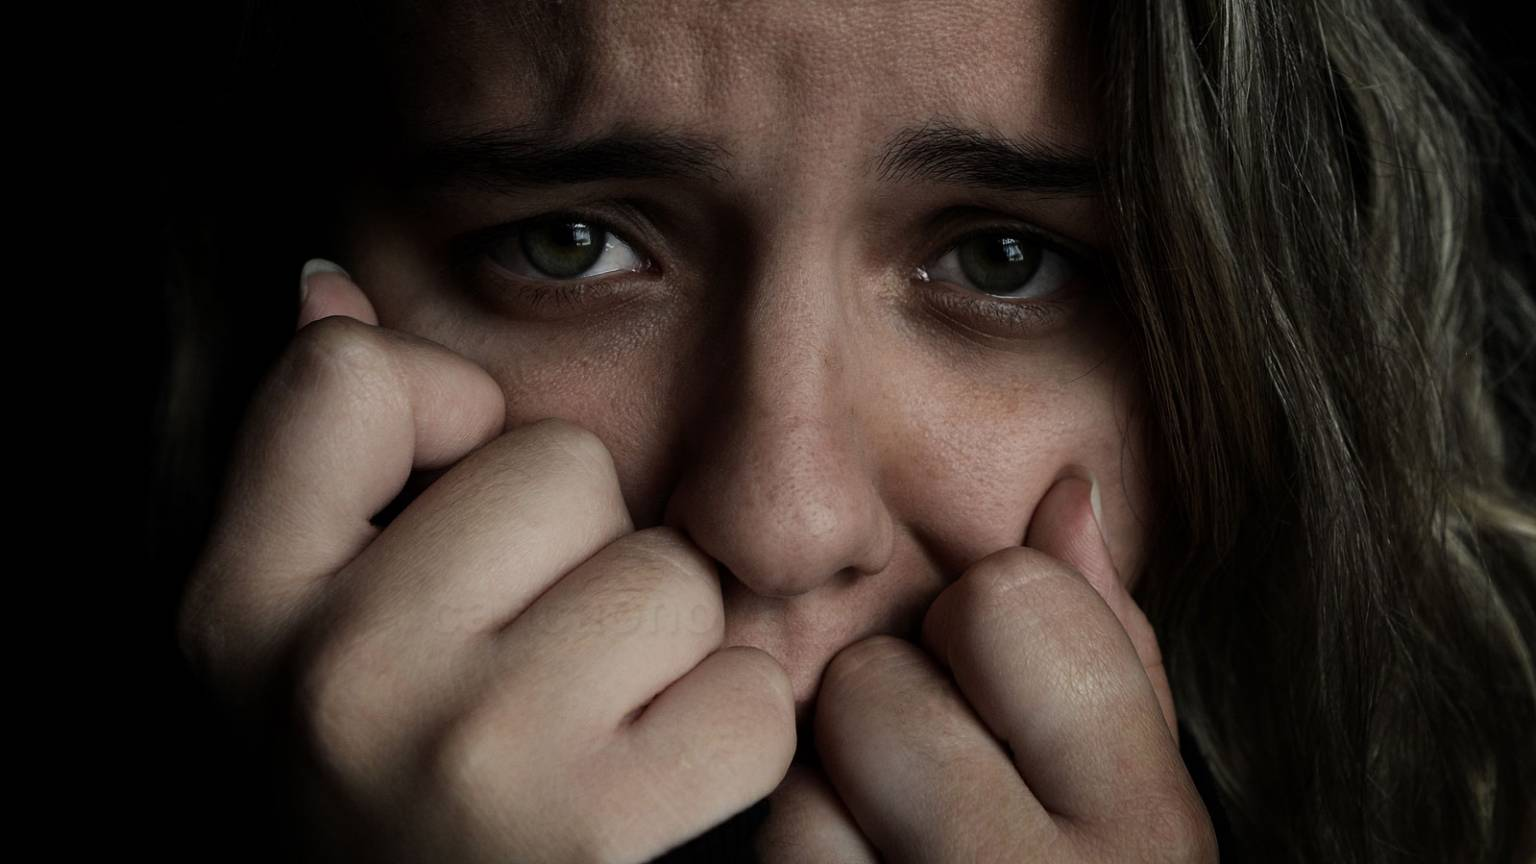 formacao_quais-sao-os-sintomas-do-ataque-de-panico-1536x864.jpg